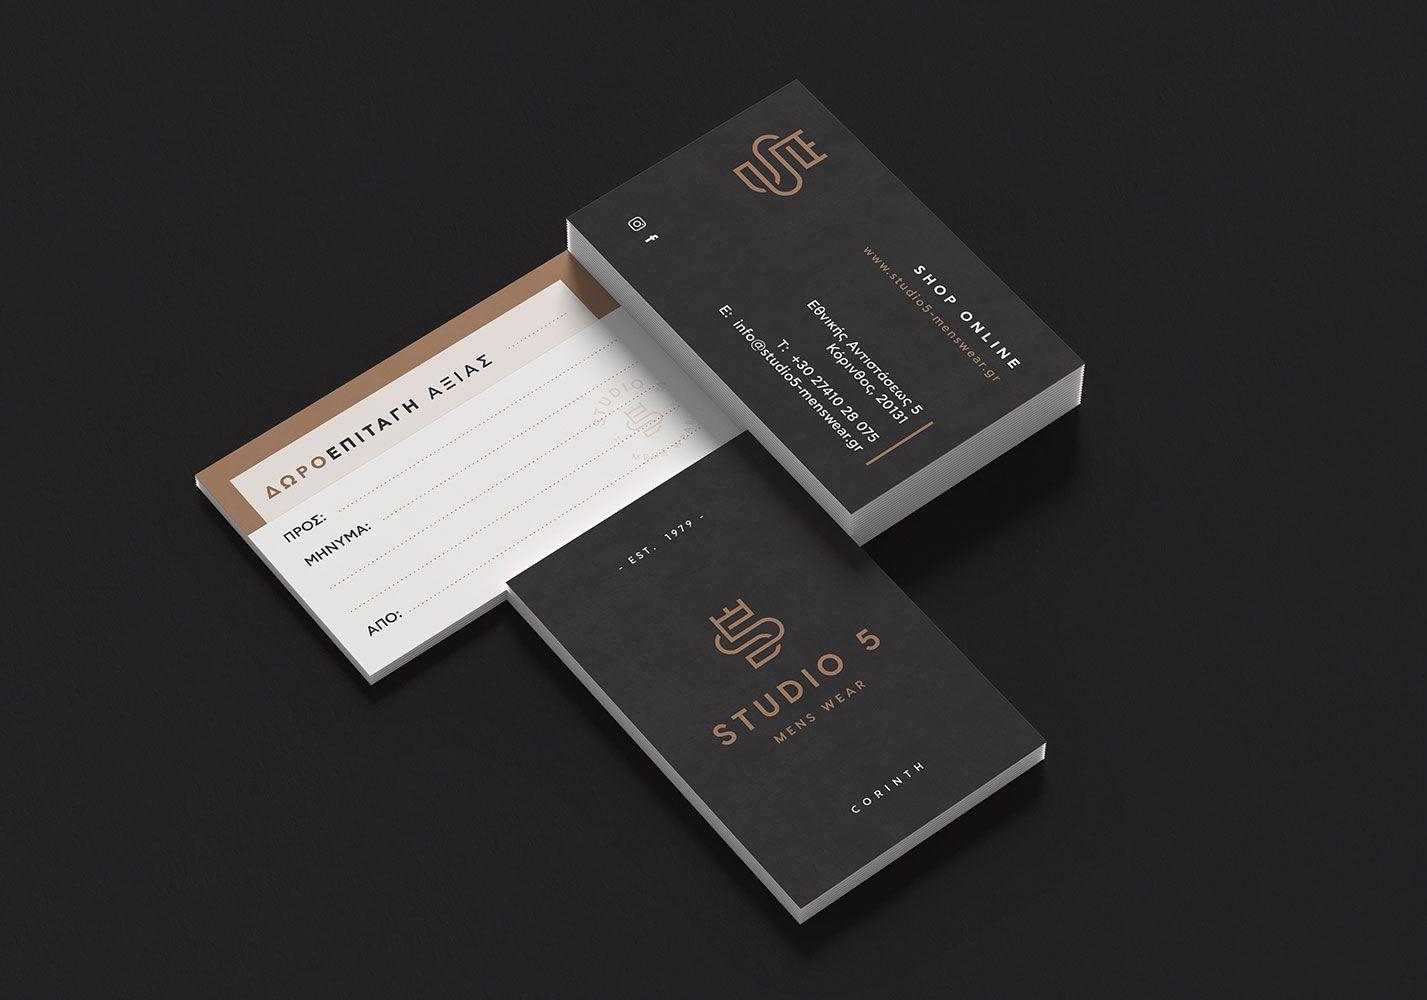 Studio5 Branding 3